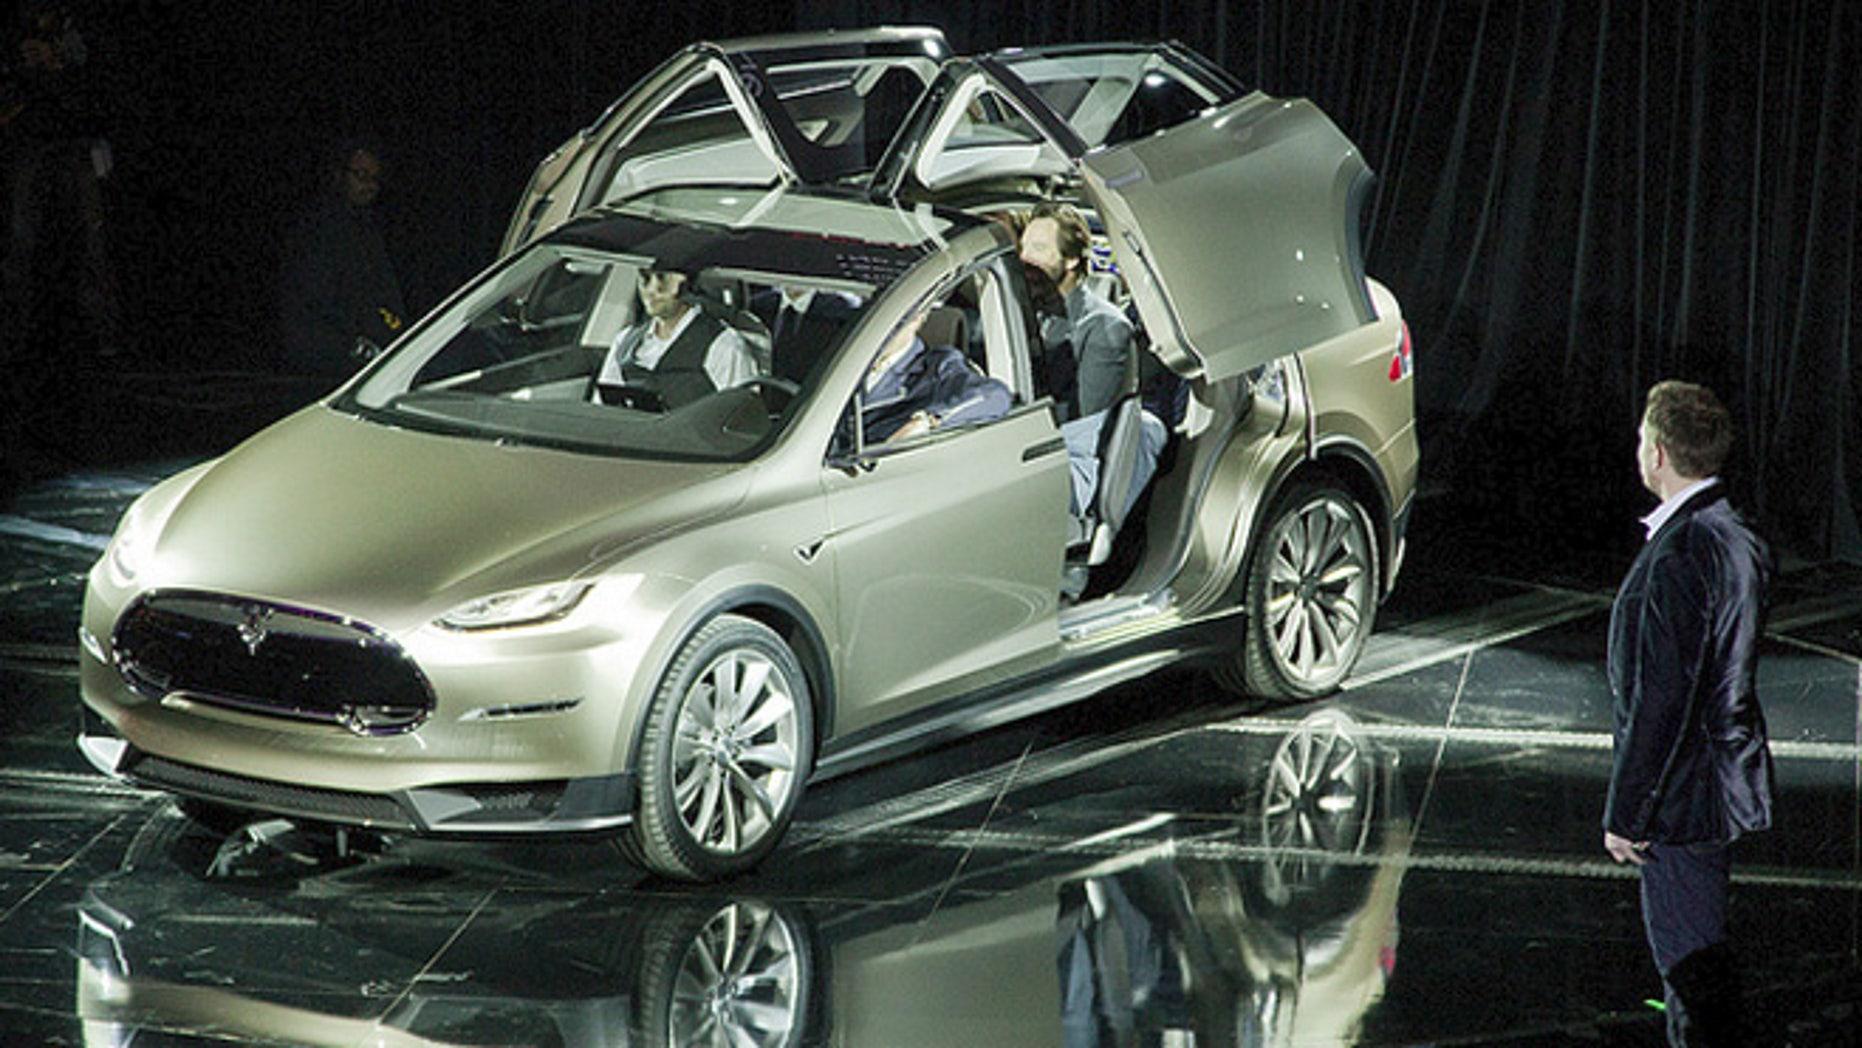 Elon Musk reveals Tesla Model X crossover concept